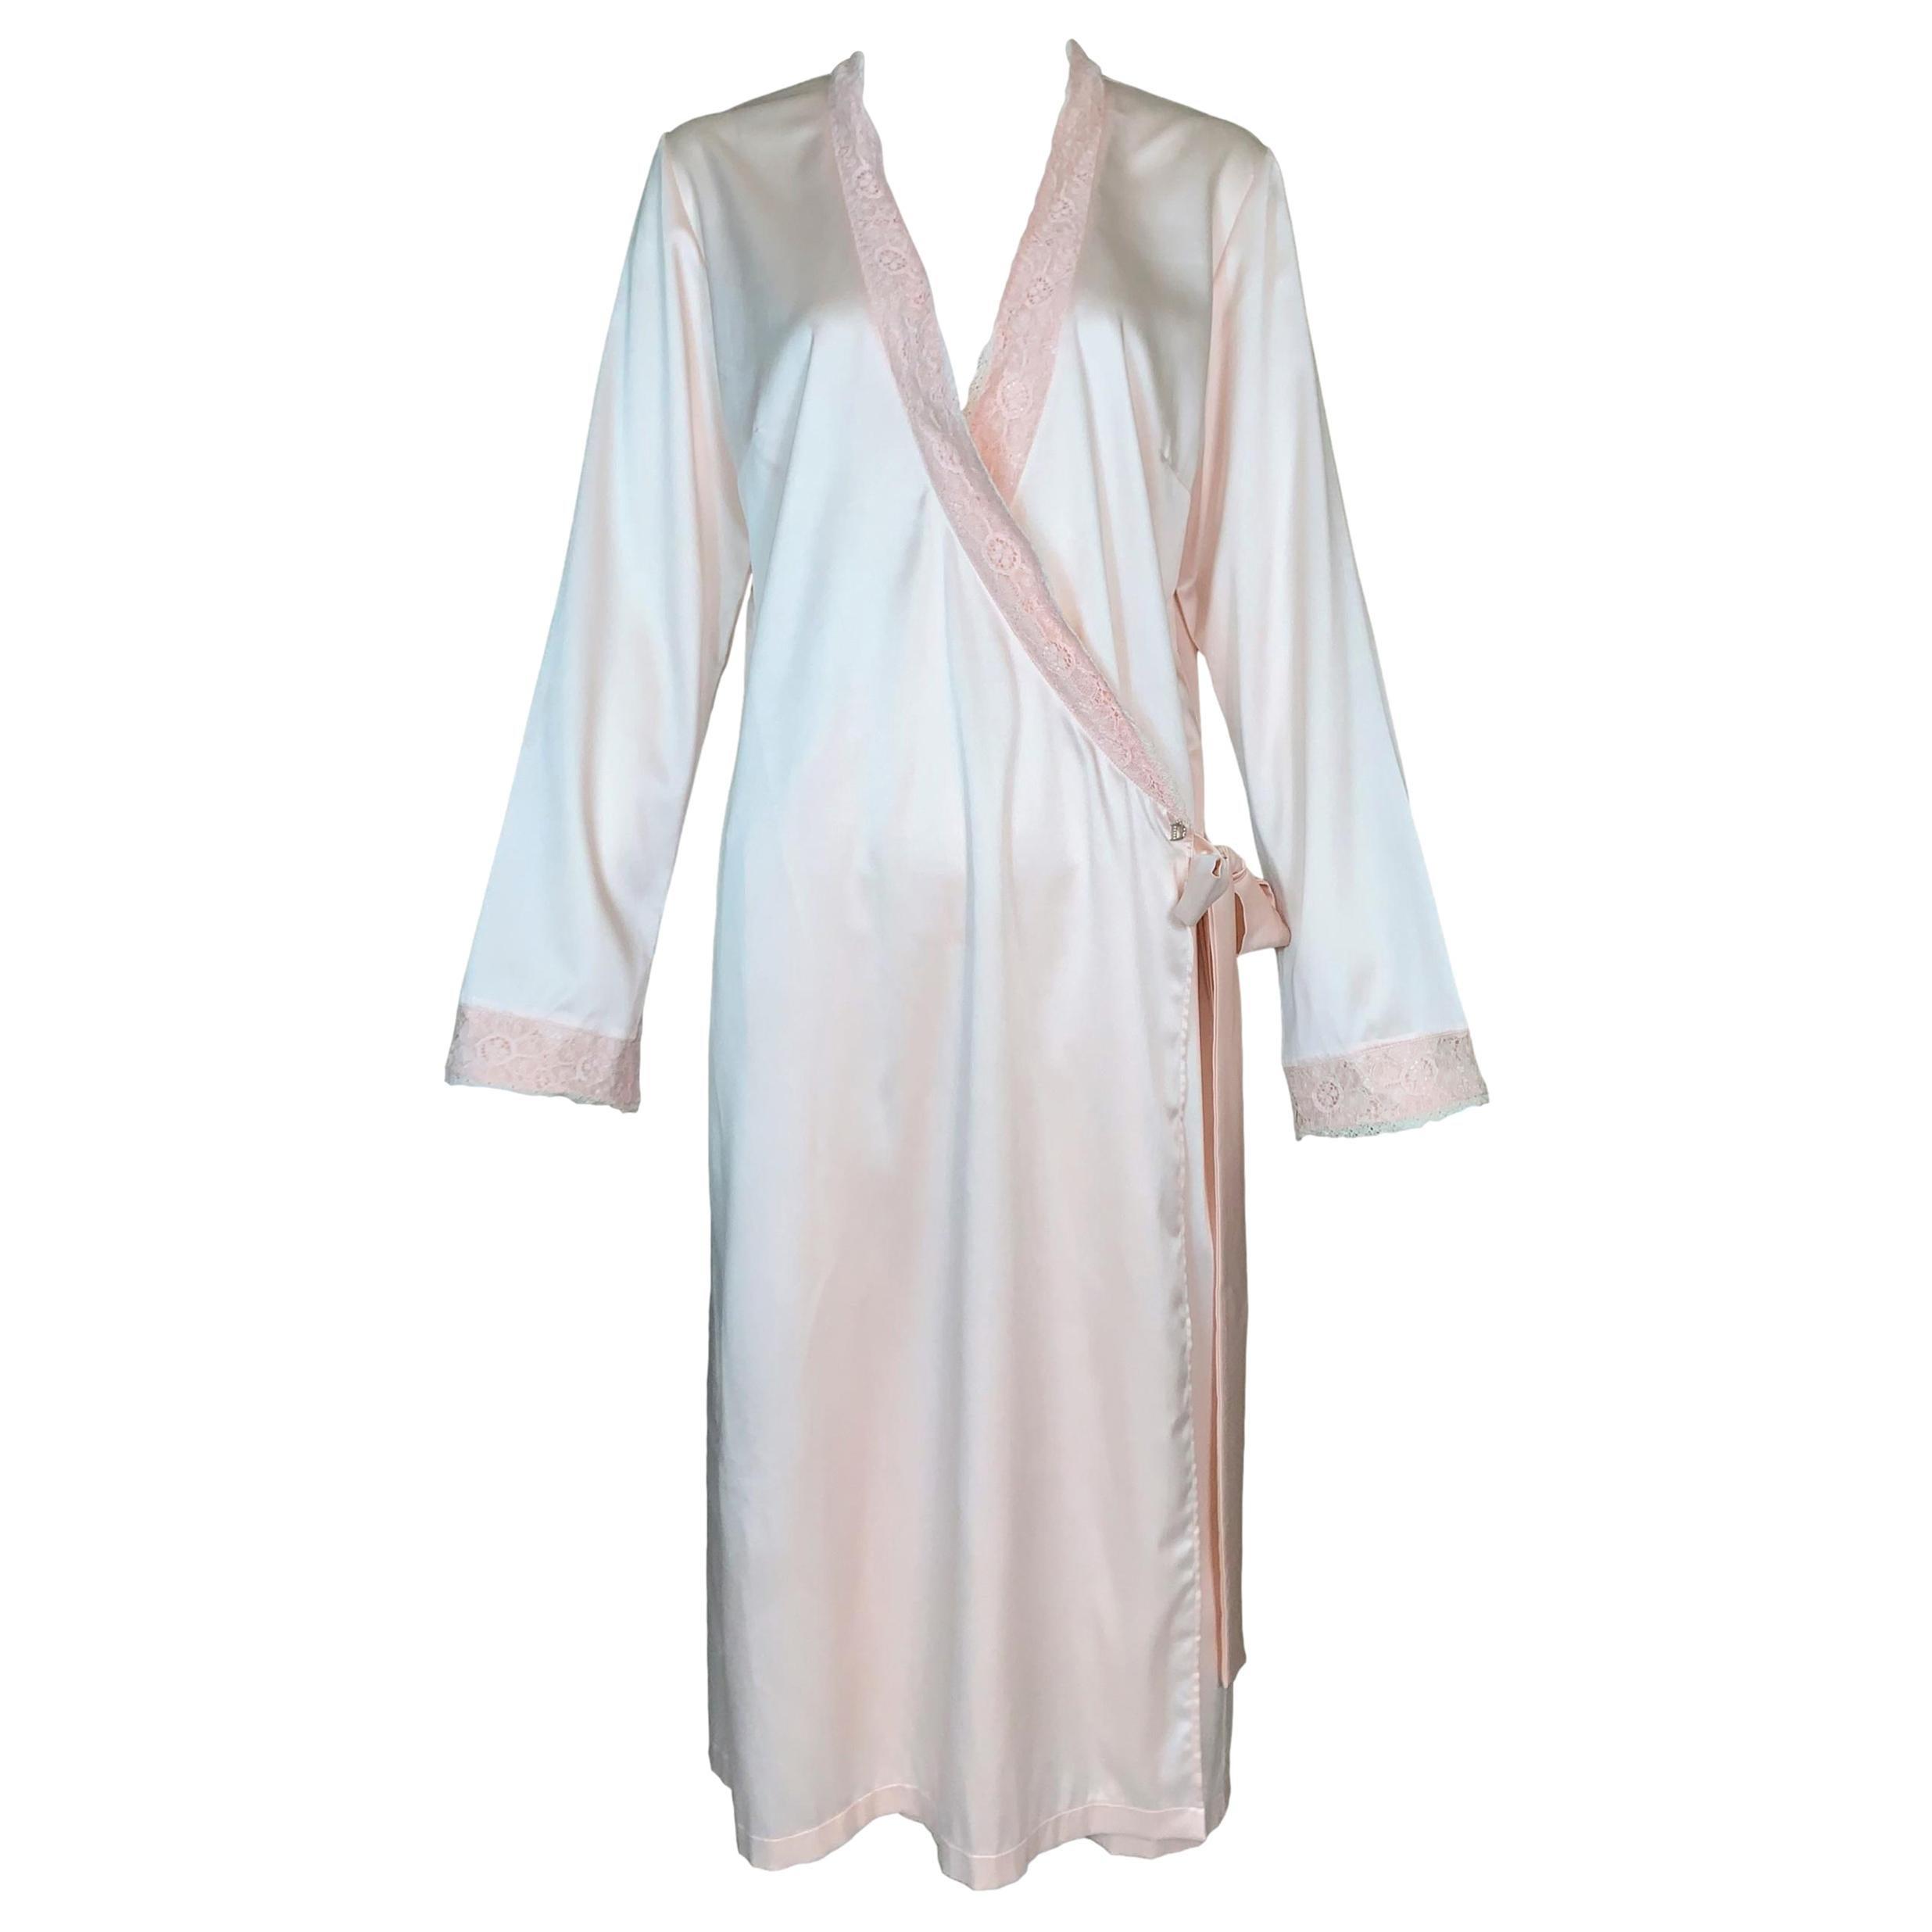 2000's Christian Dior John Galliano Pastel Pink Satin Robe Dress